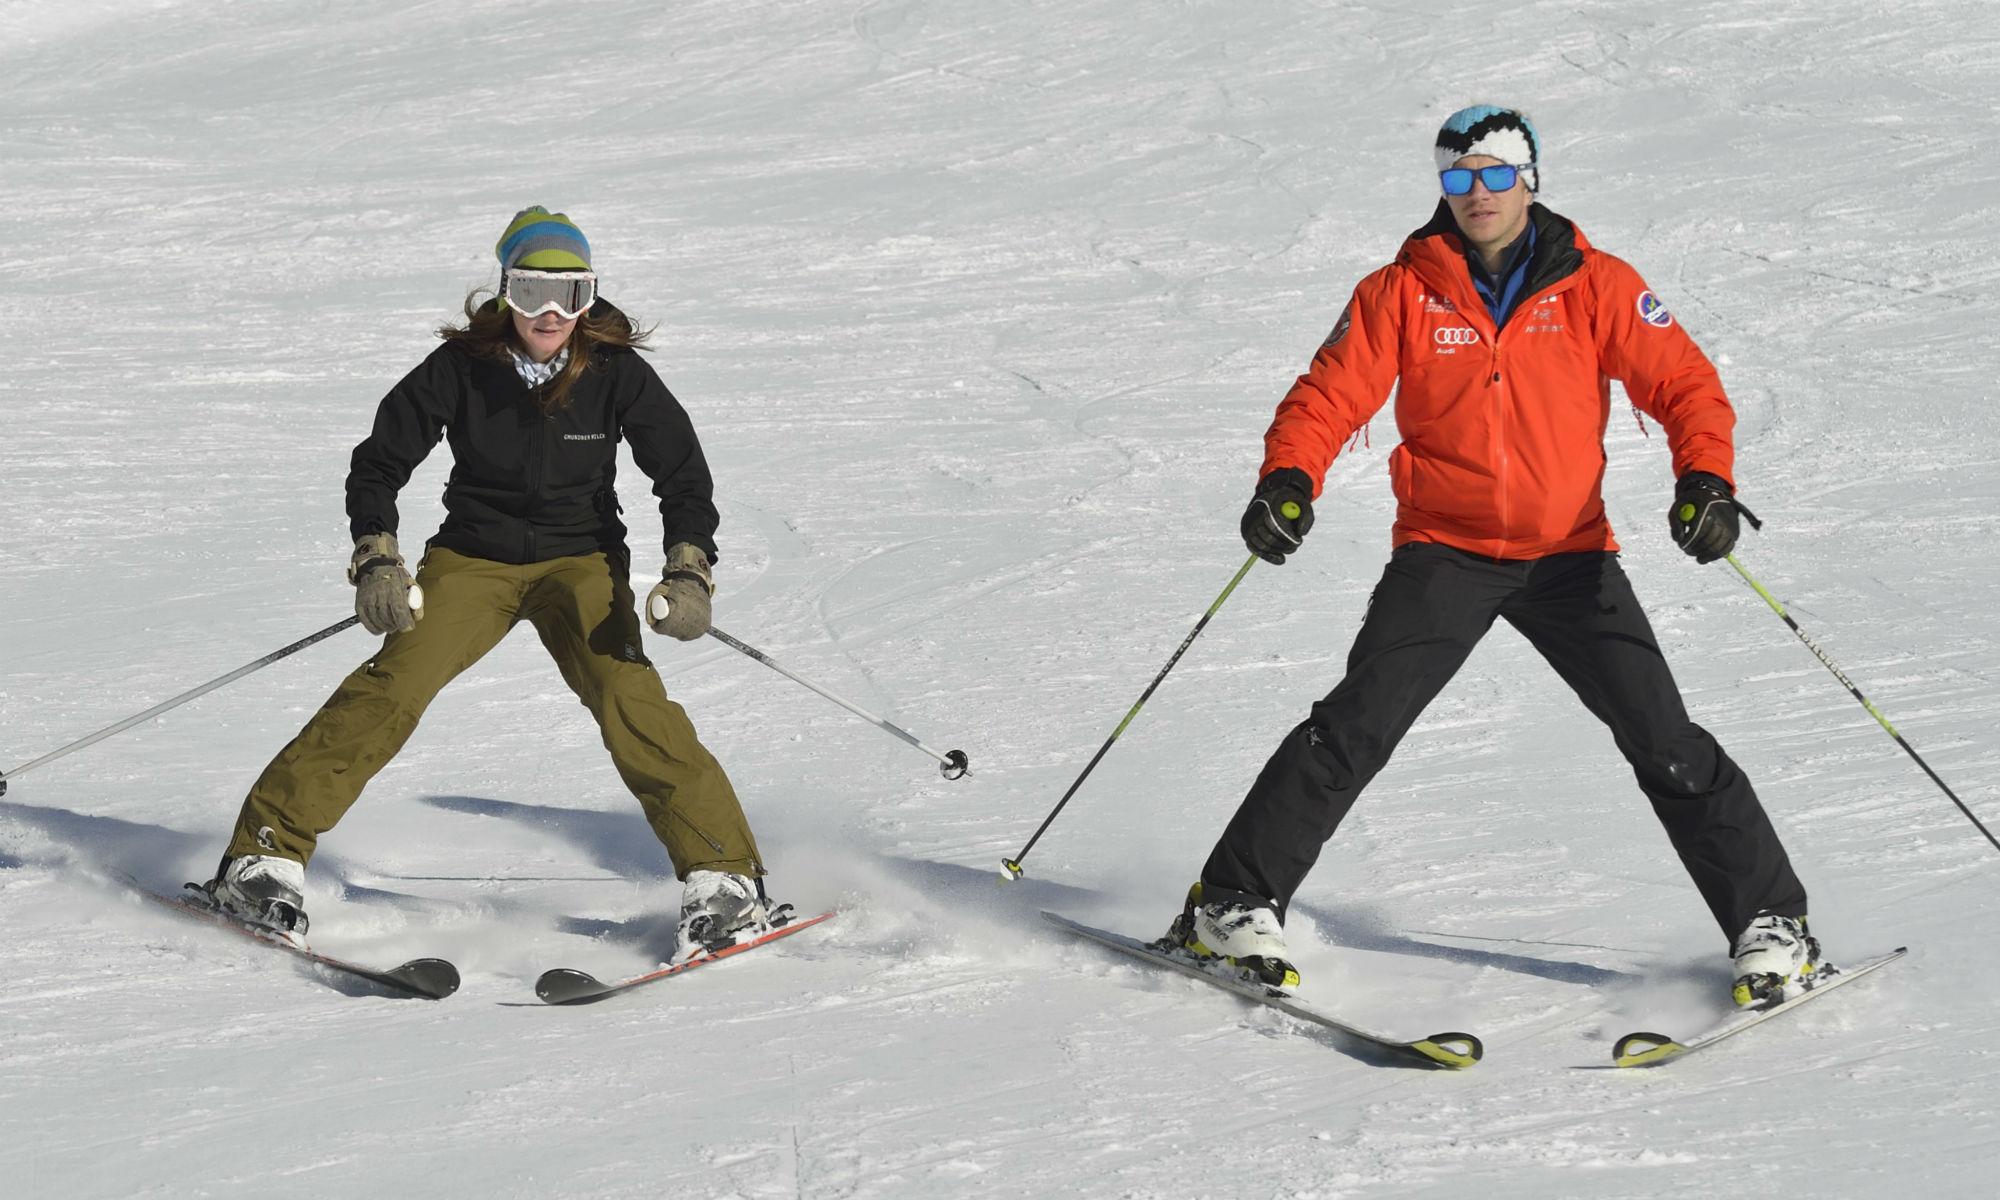 Ski instructor and beginner practising the snow plough on the skiing piste.